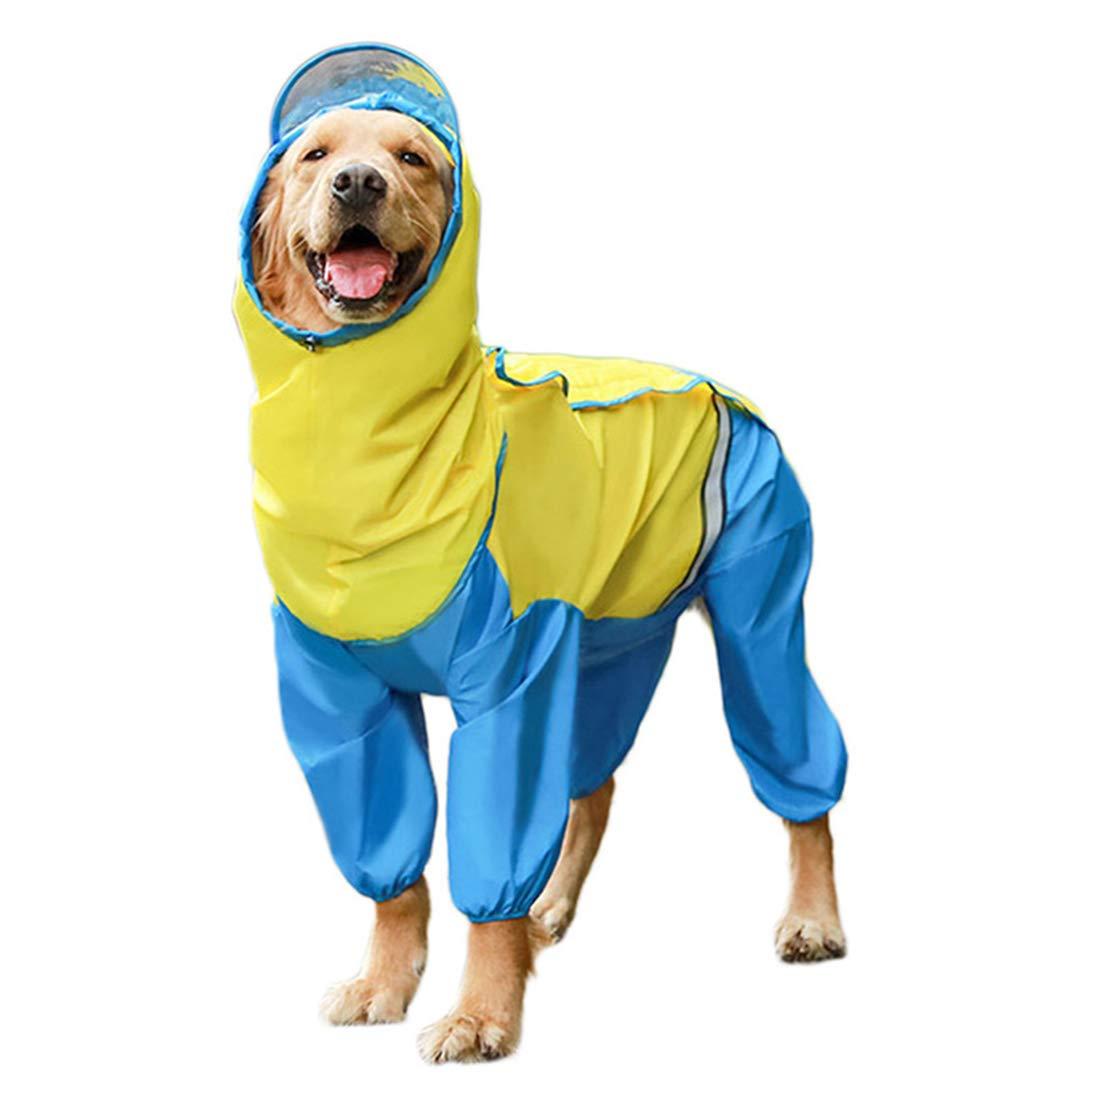 MYTMCW Pet Dog Raincoat Breathable Waterproof Dog Hooded Jumpsuit Raincoat for Dogs Pet Cloak Labrador Waterproof Golden Retriever Jacket,Blue,3XL